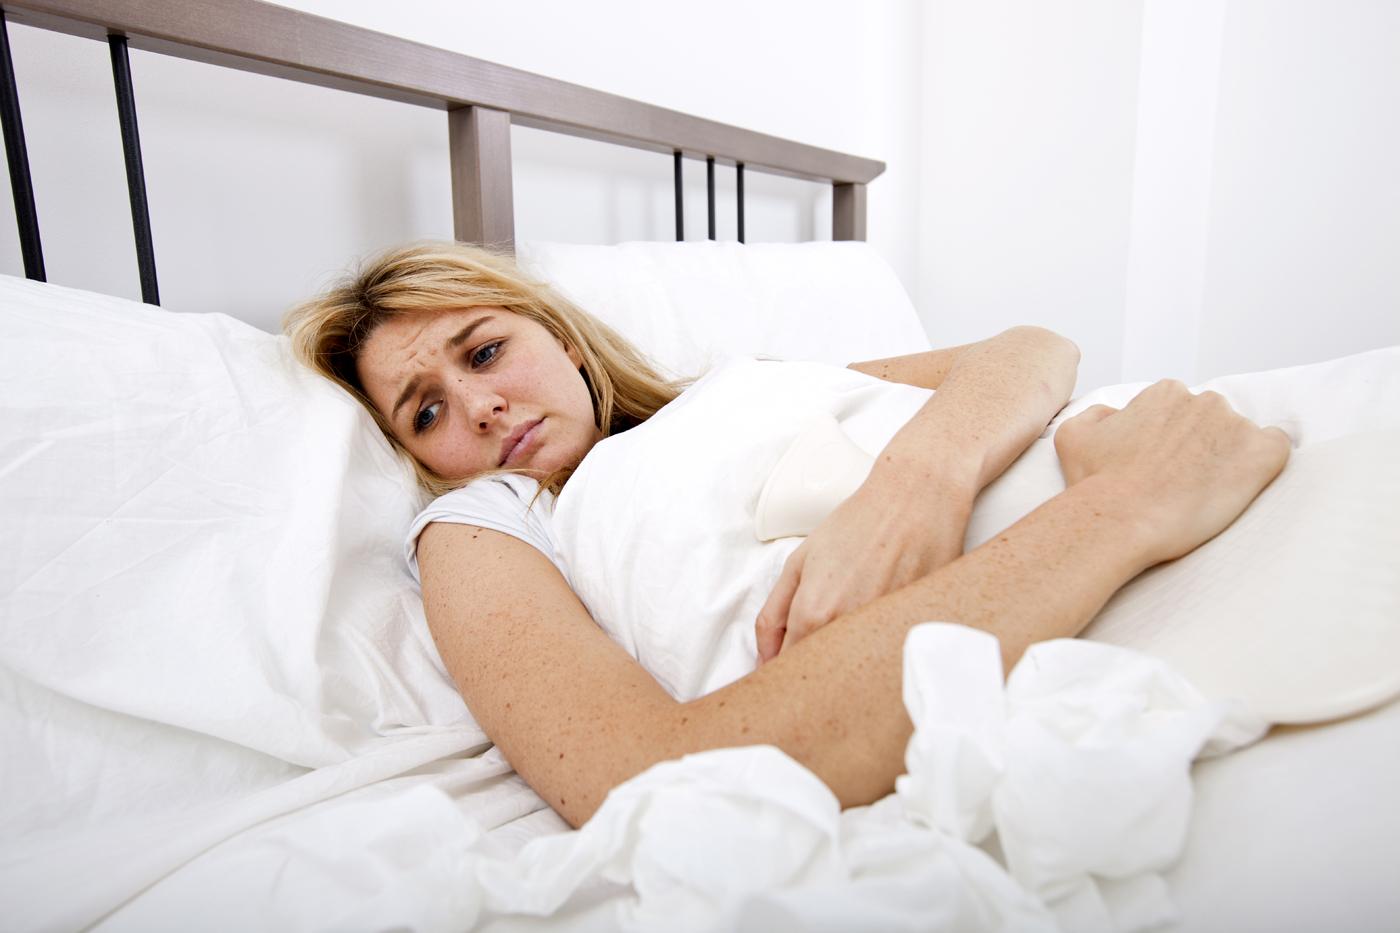 Woman-suffering-from-abdomen-pain-in-bed.jpg